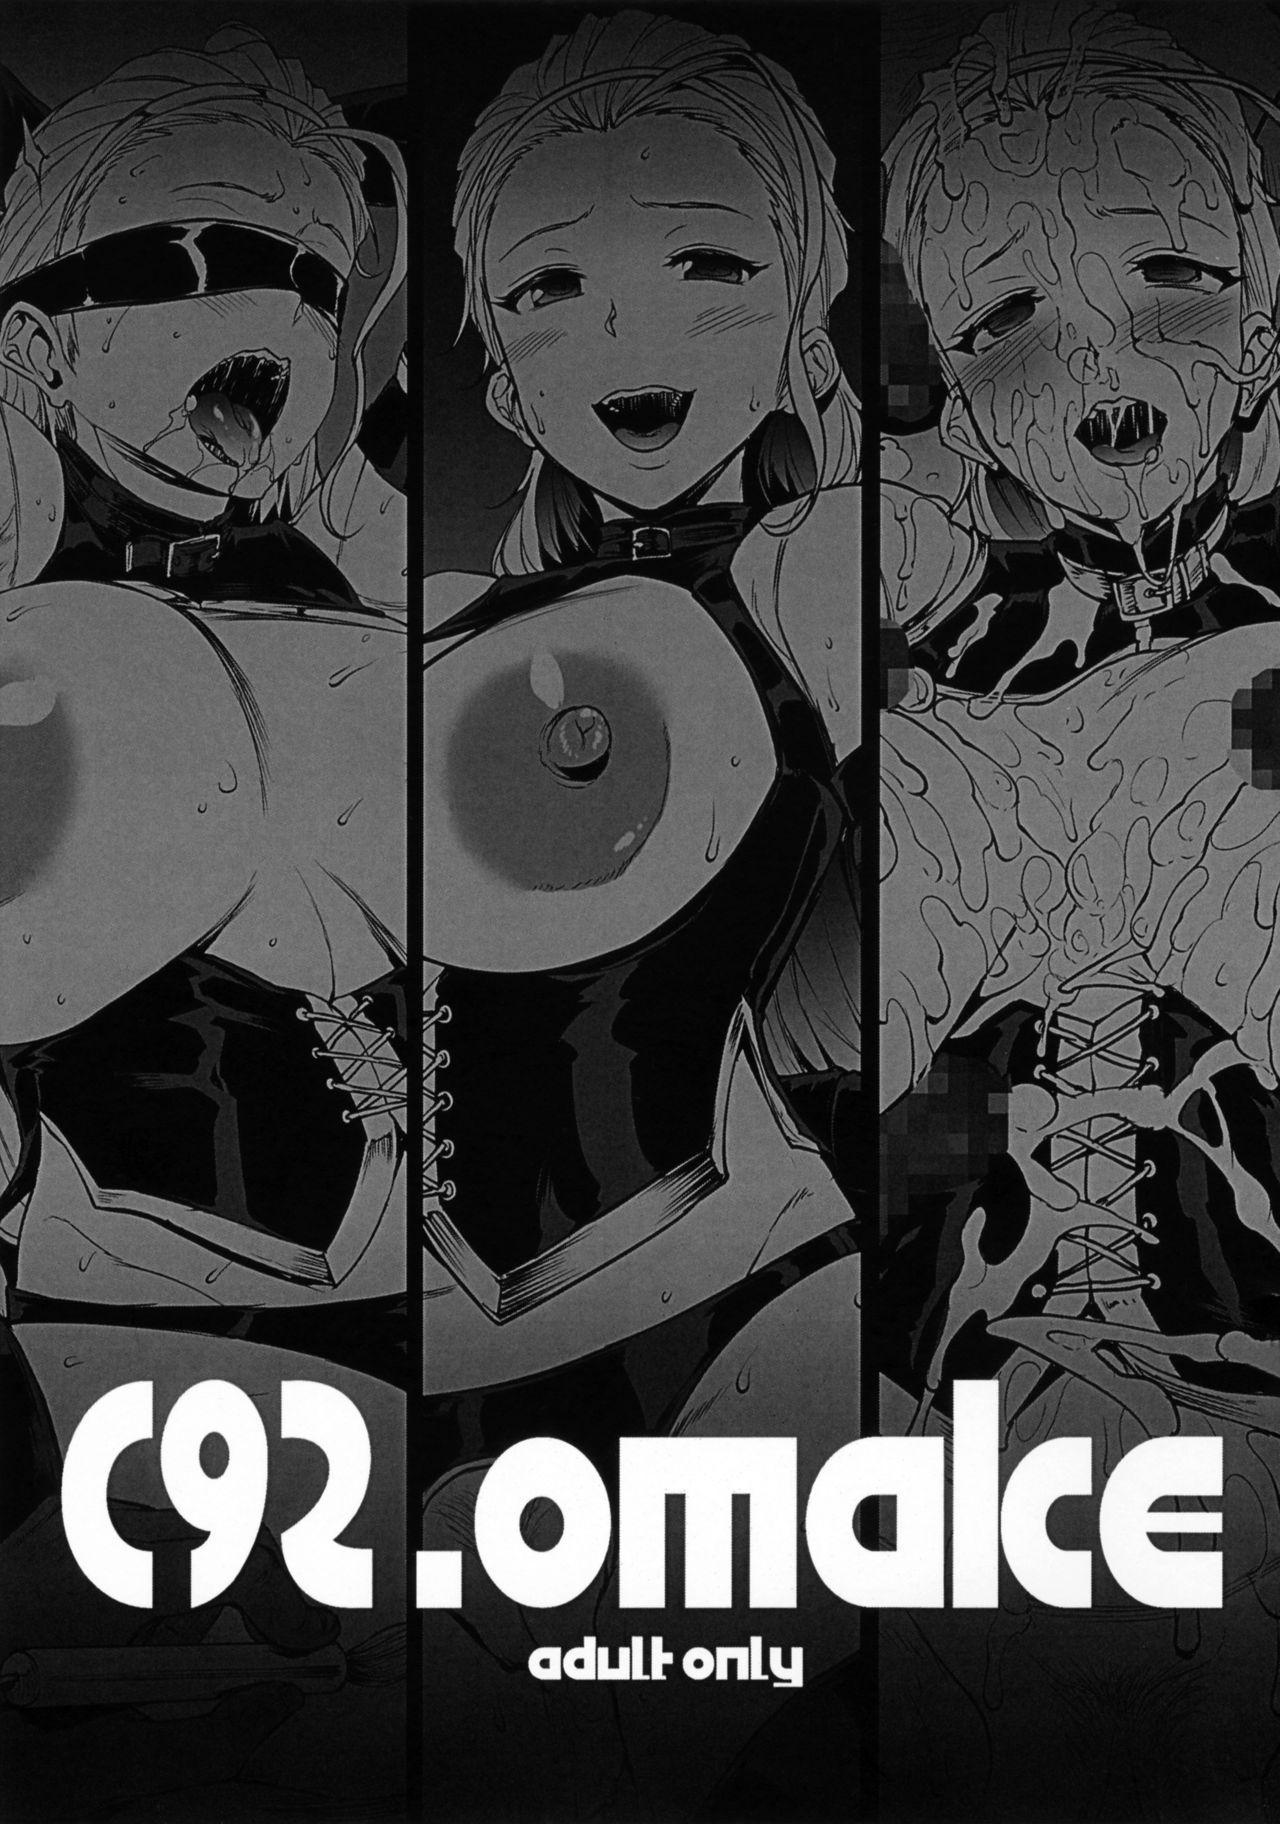 C92. omake 0